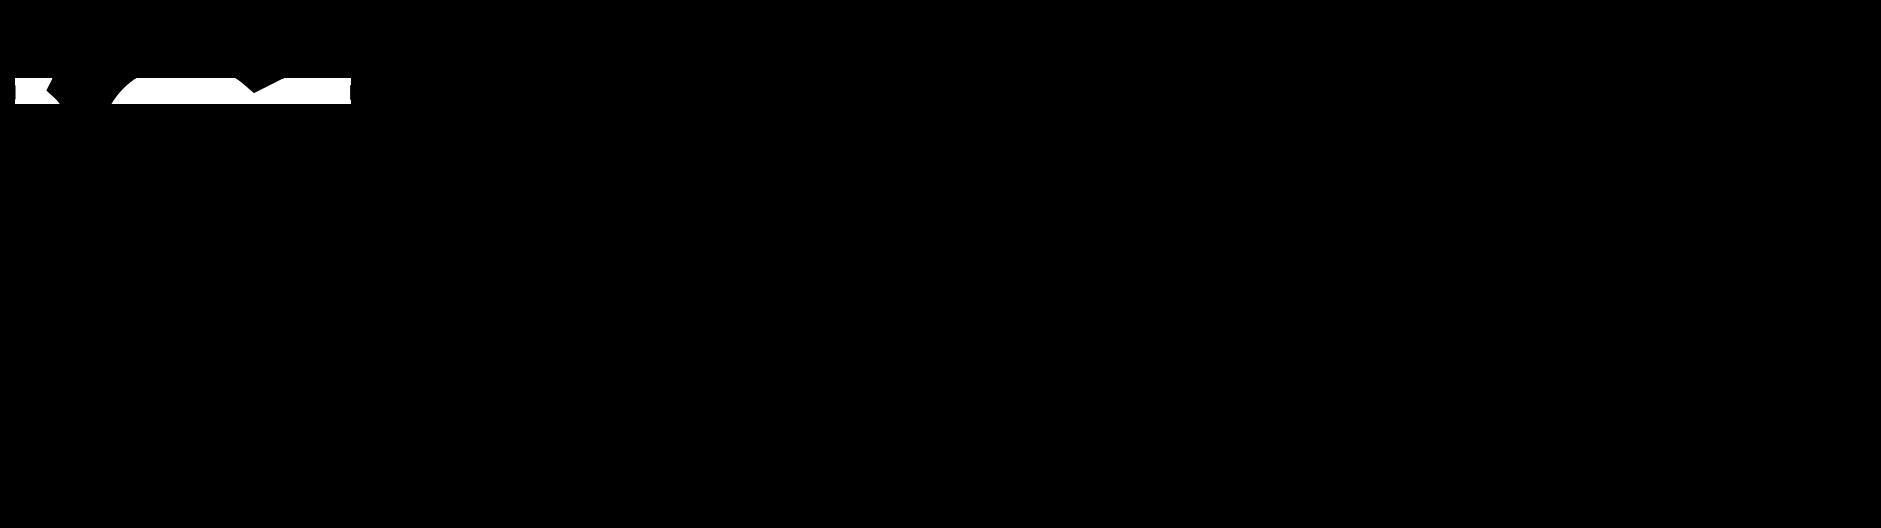 greppmeier_Logo_schwarz_neu